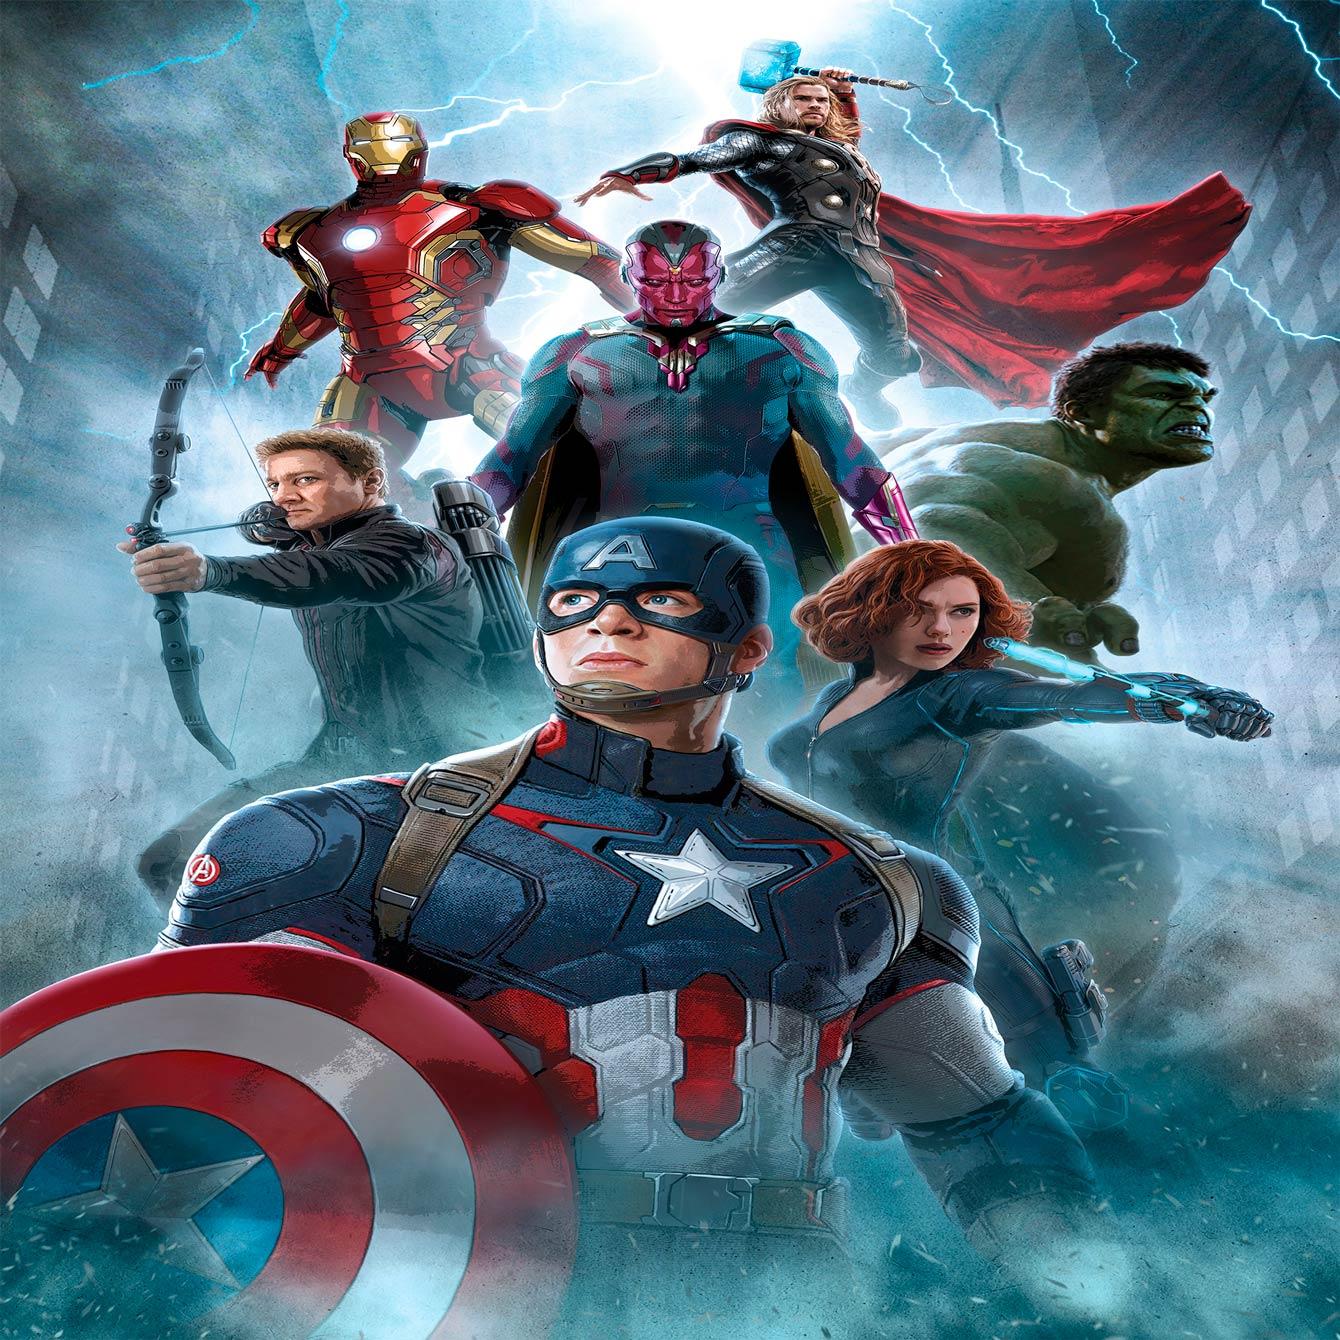 Papel De Parede Adesivo, Infantil Vingadores Marvel Clássico 1X1  - Final Decor